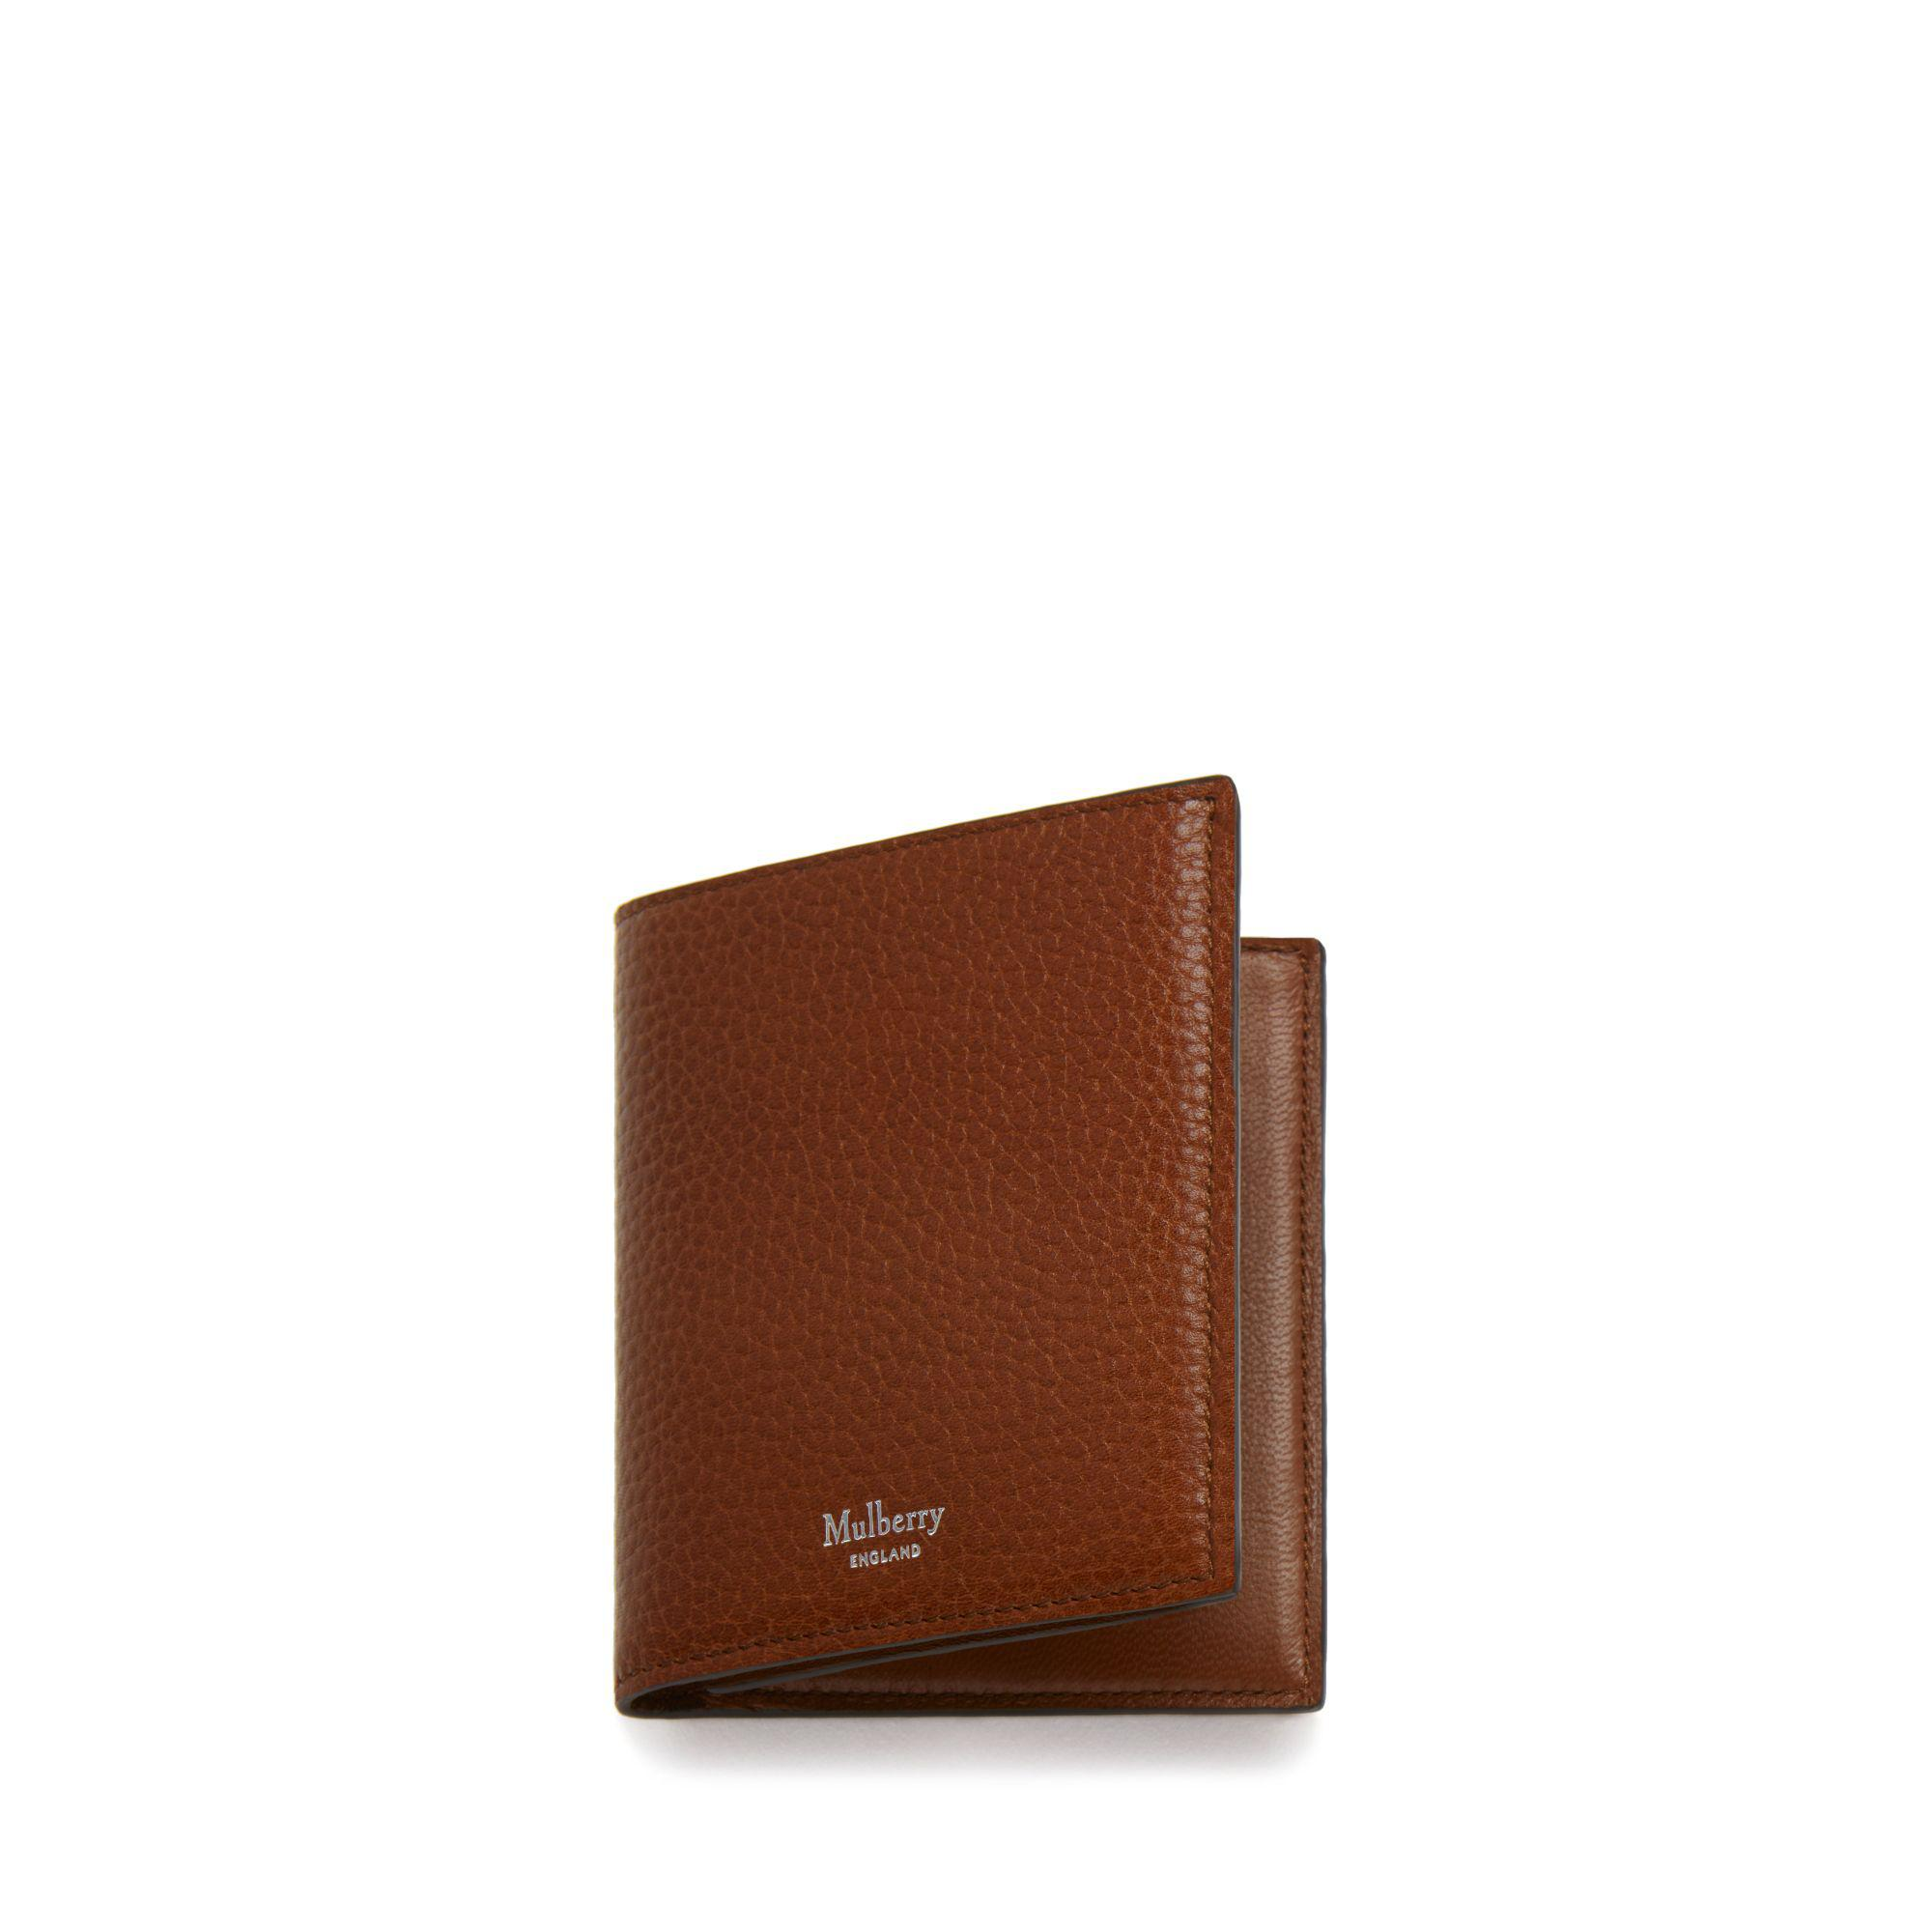 4178d5d39d734 Mulberry - Multicolor Trifold Wallet In Oak Natural Grain Leather for Men -  Lyst. View fullscreen